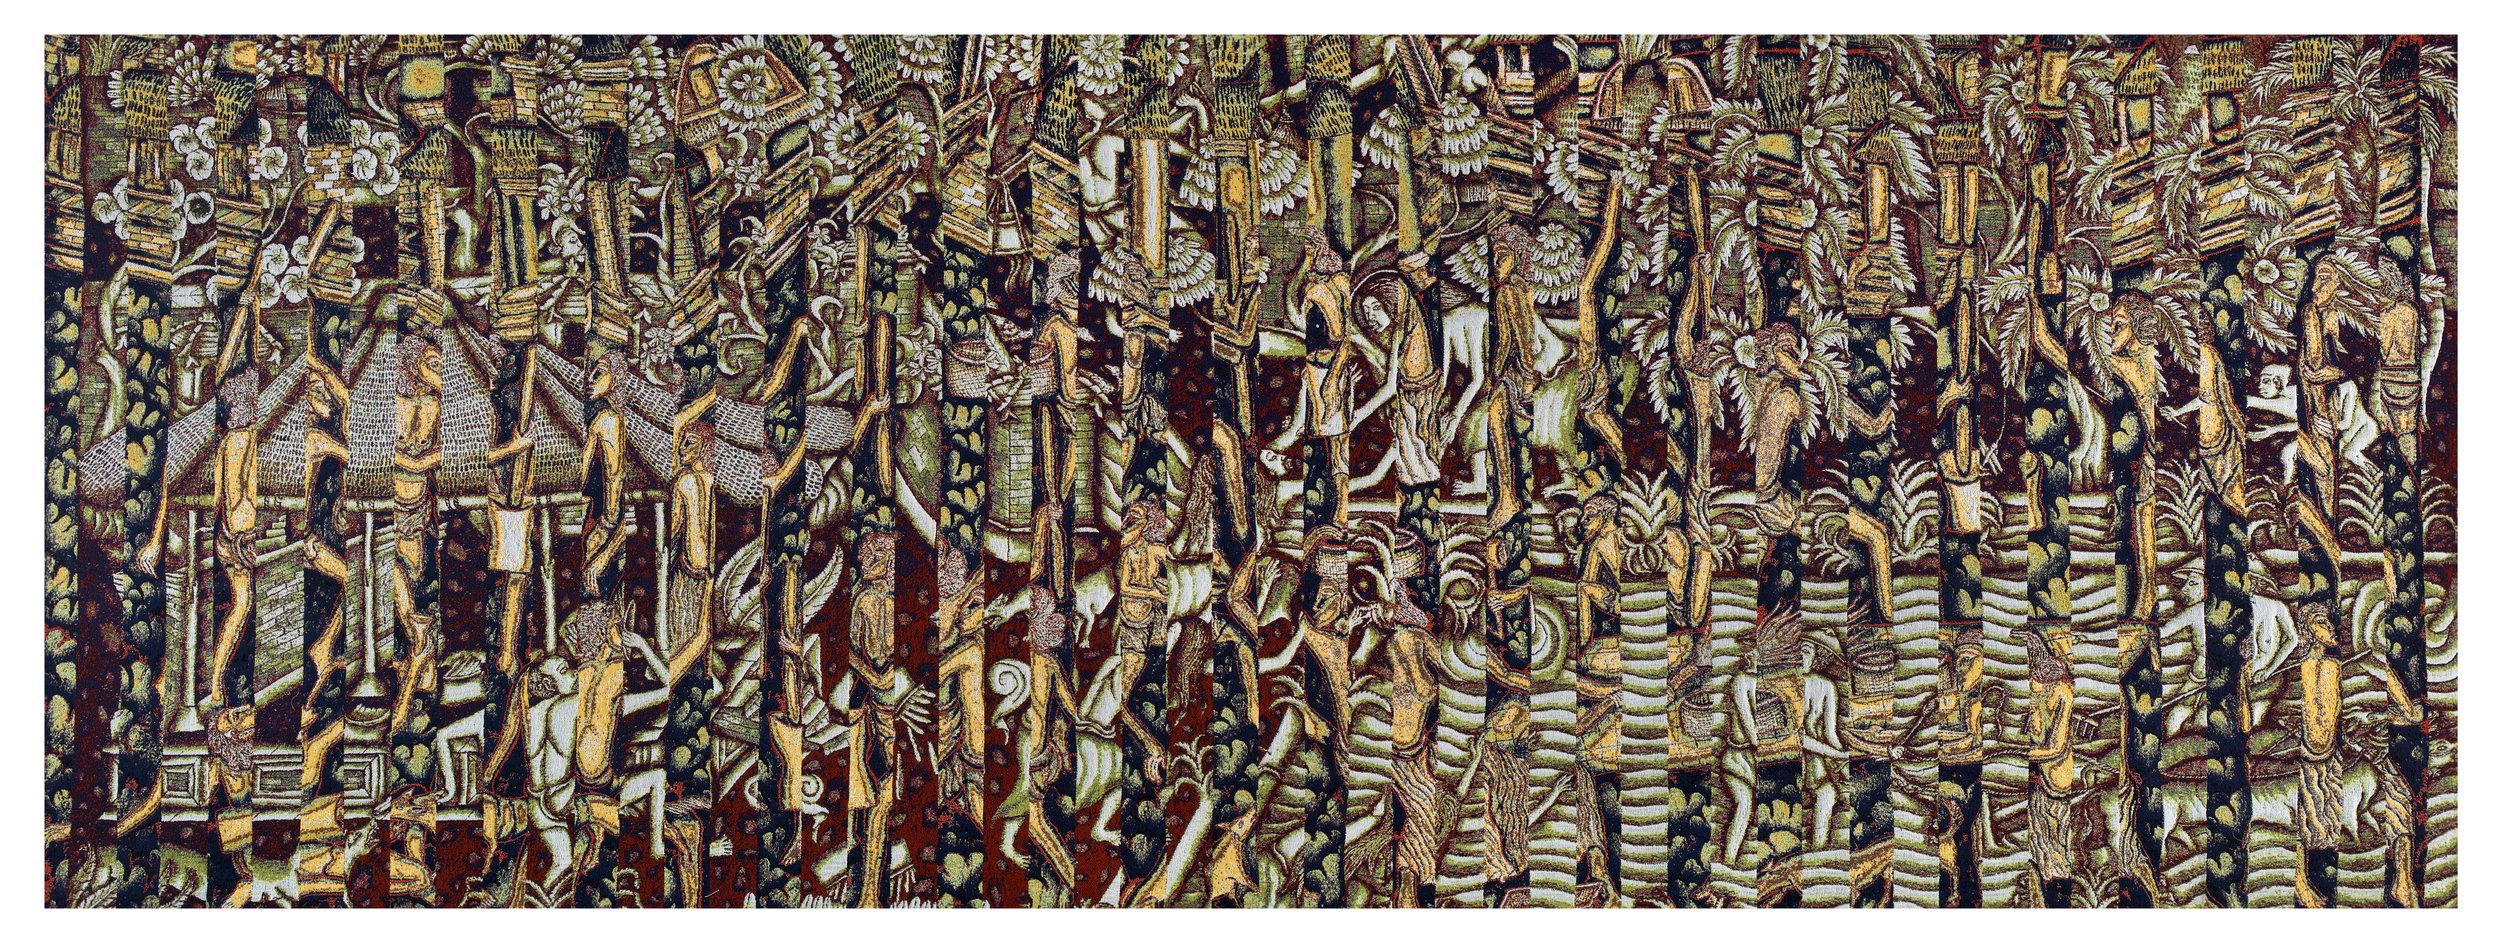 Batuan 2, jacquard woven, 144 x 383 cm